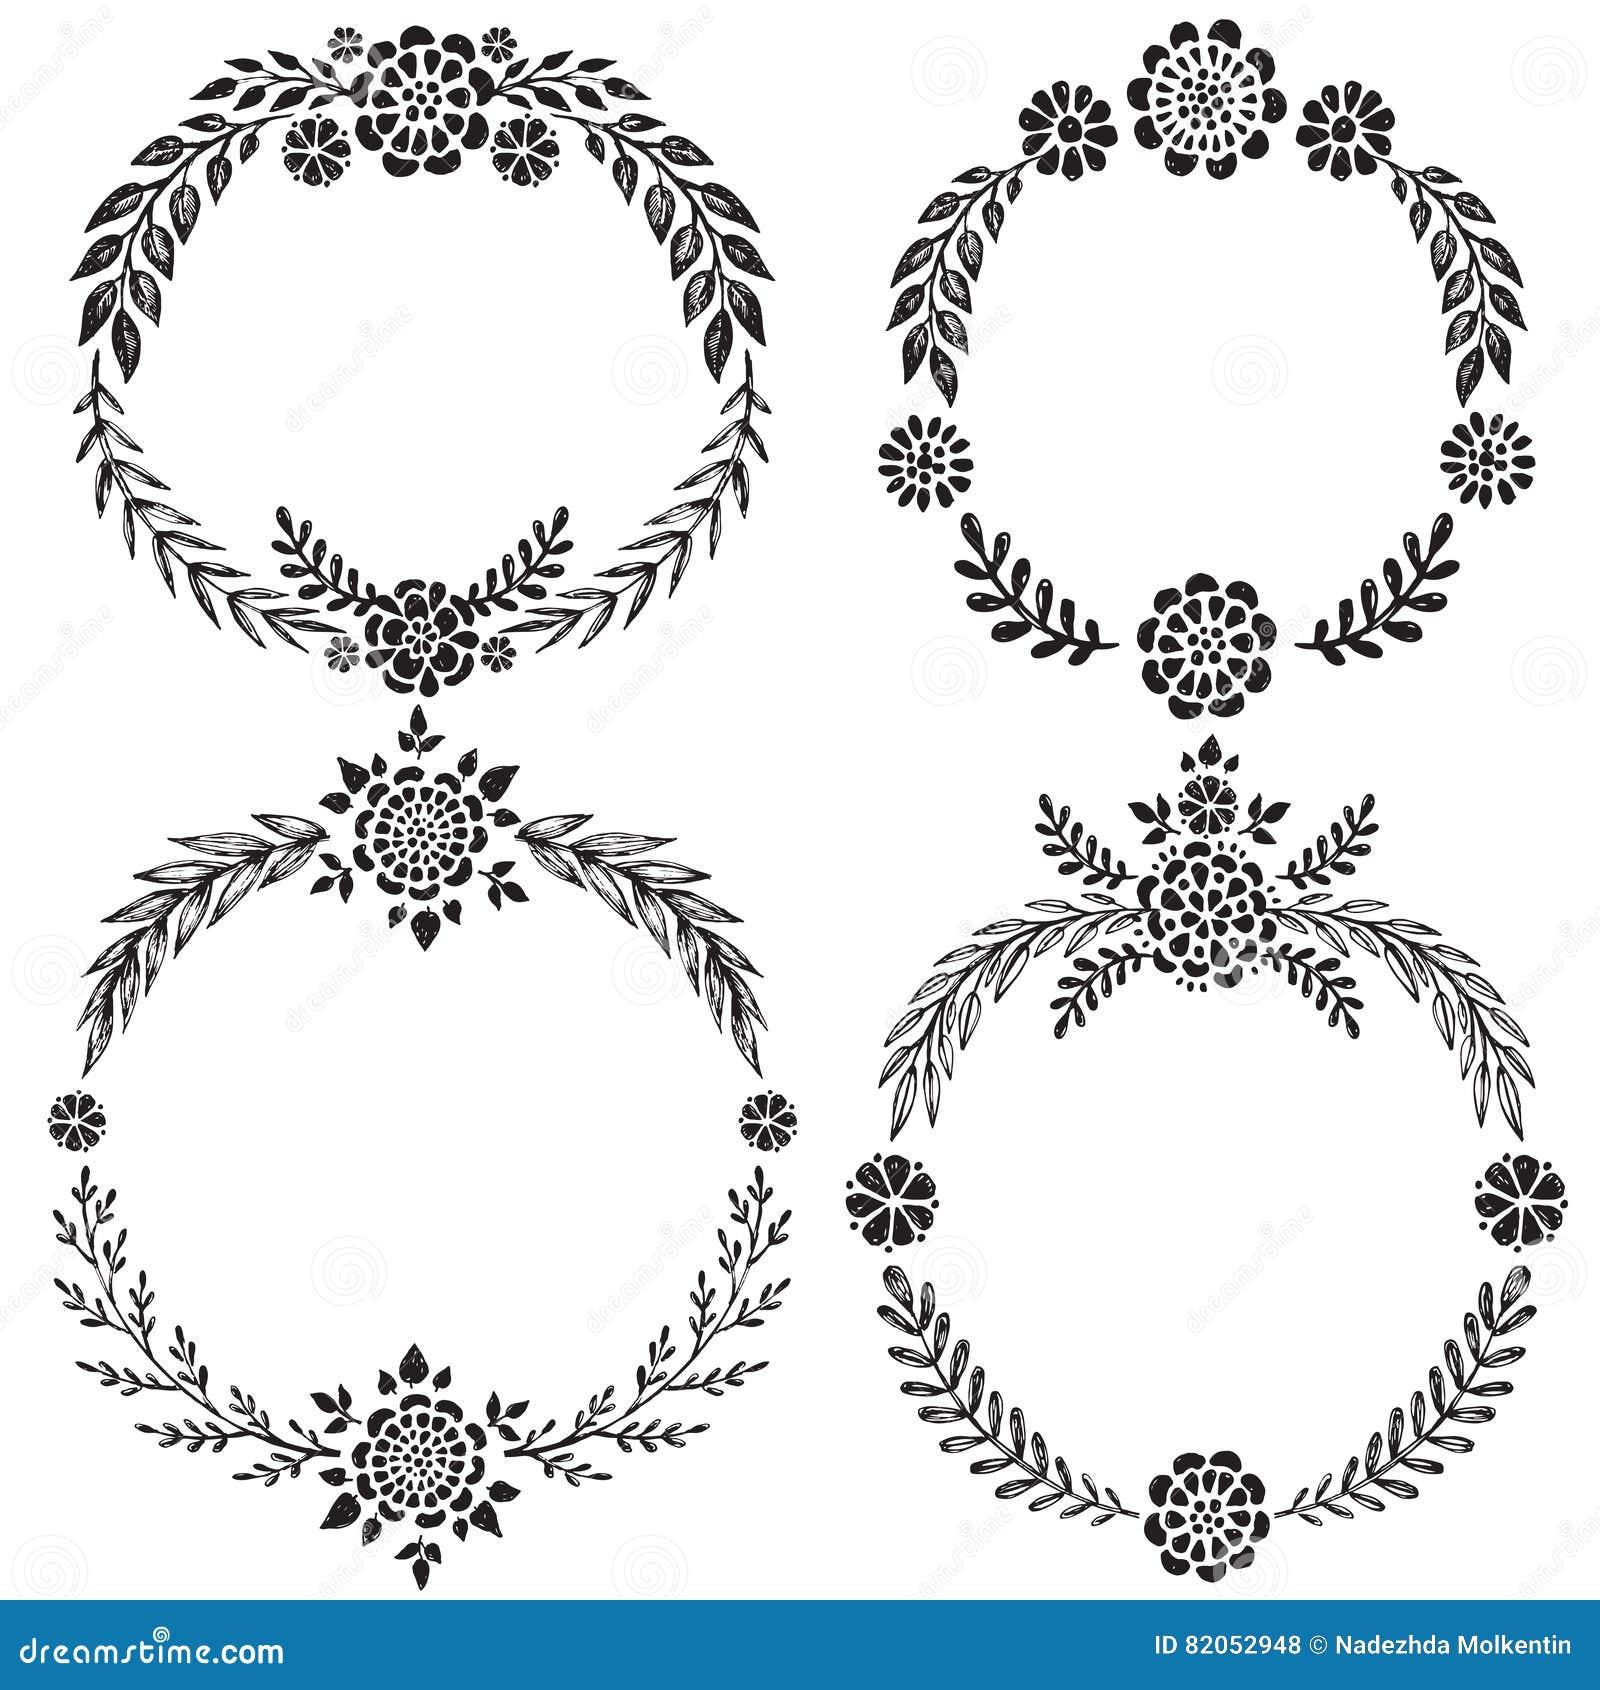 Set Of Black Flower Design Elements From My Big Floral: Vintage Set Of Hand Drawn Rustic Wreaths. Floral Vector